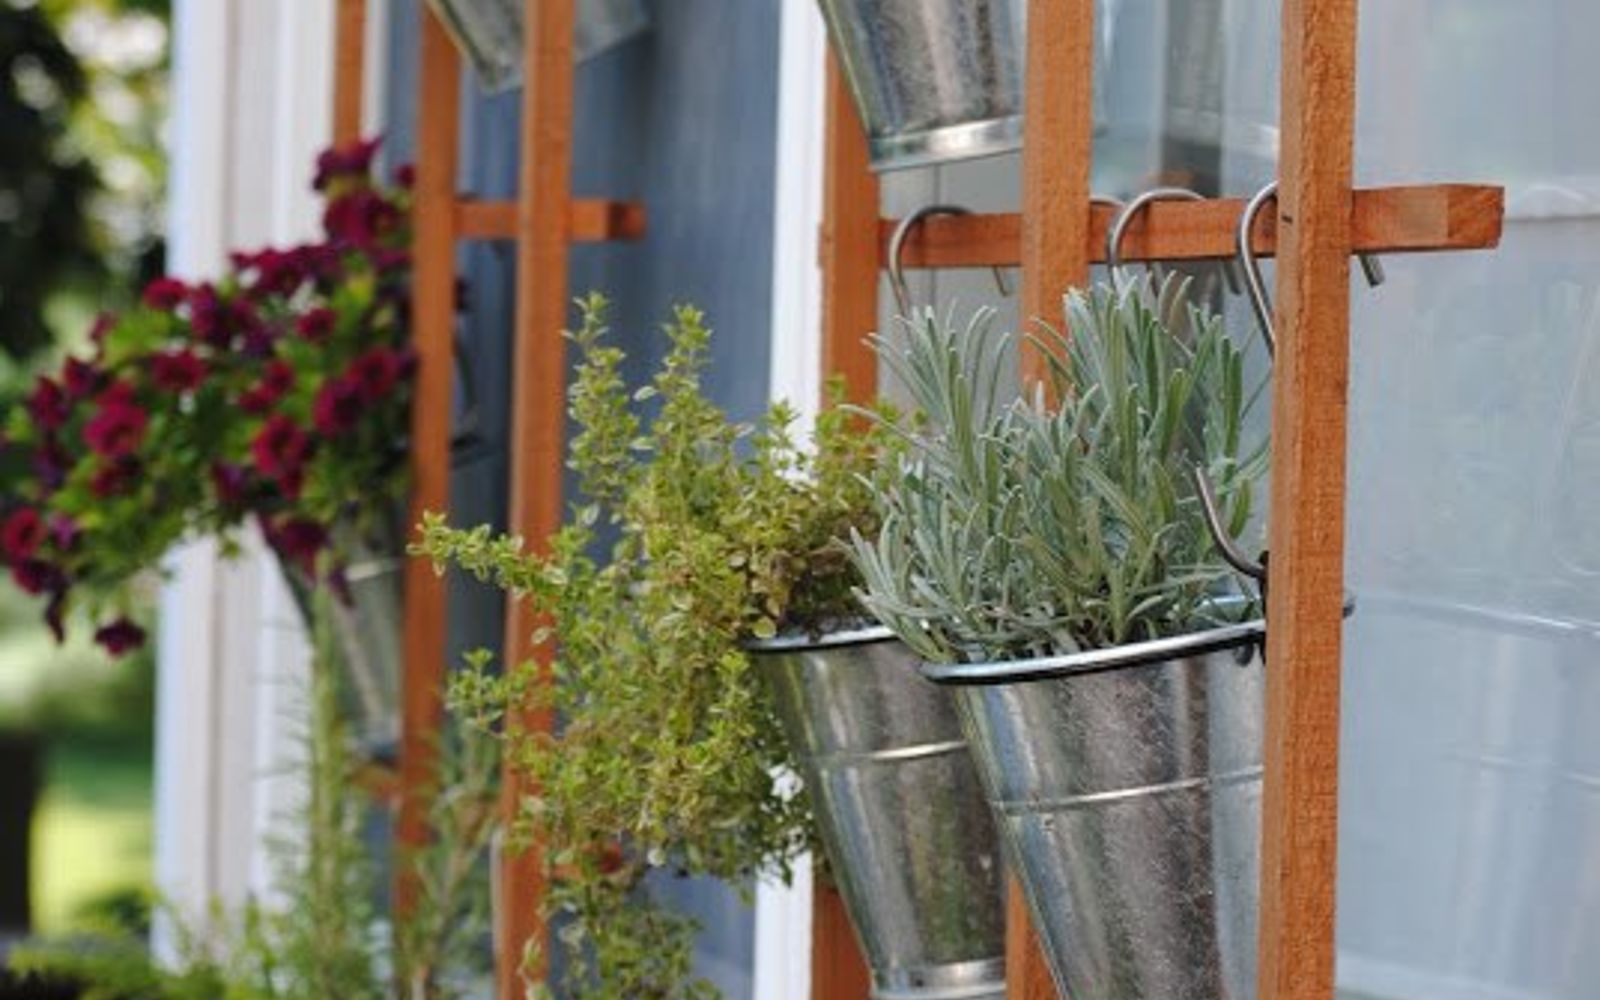 s 17 ways to build a gorgeous garden trellis this summer, gardening, Make a garden grid that doubles as a trellis